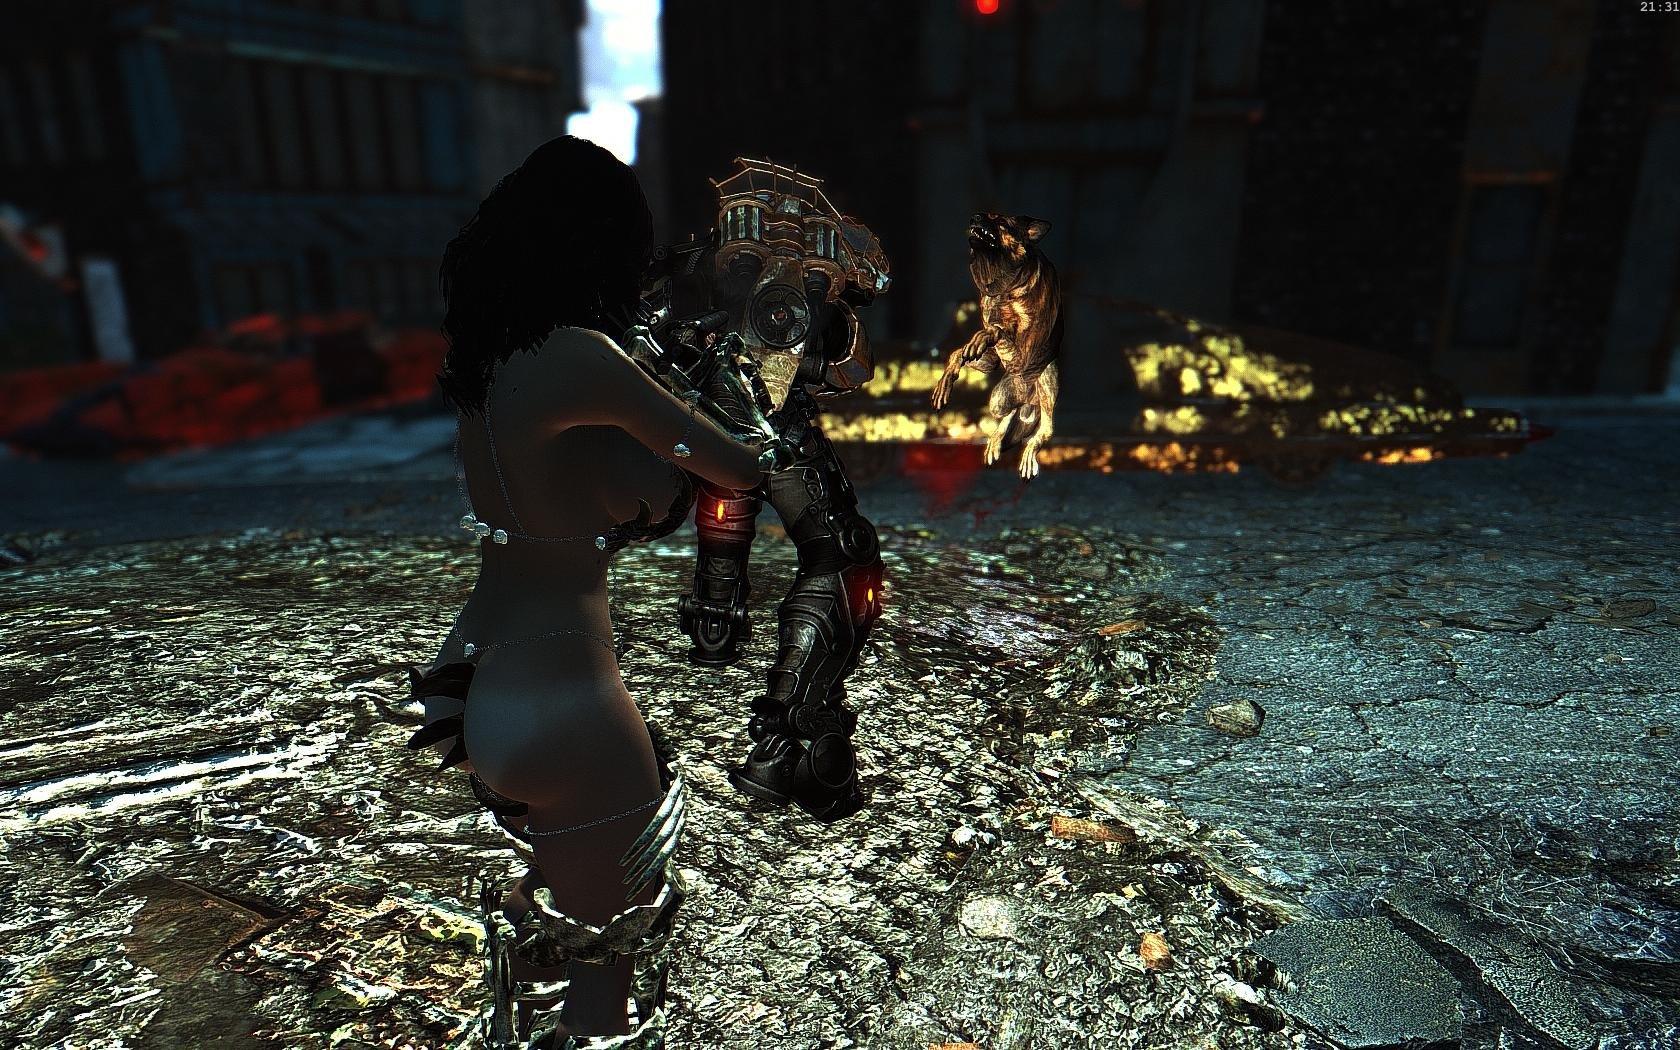 Fallout4 2019-01-03 21-31-02-49